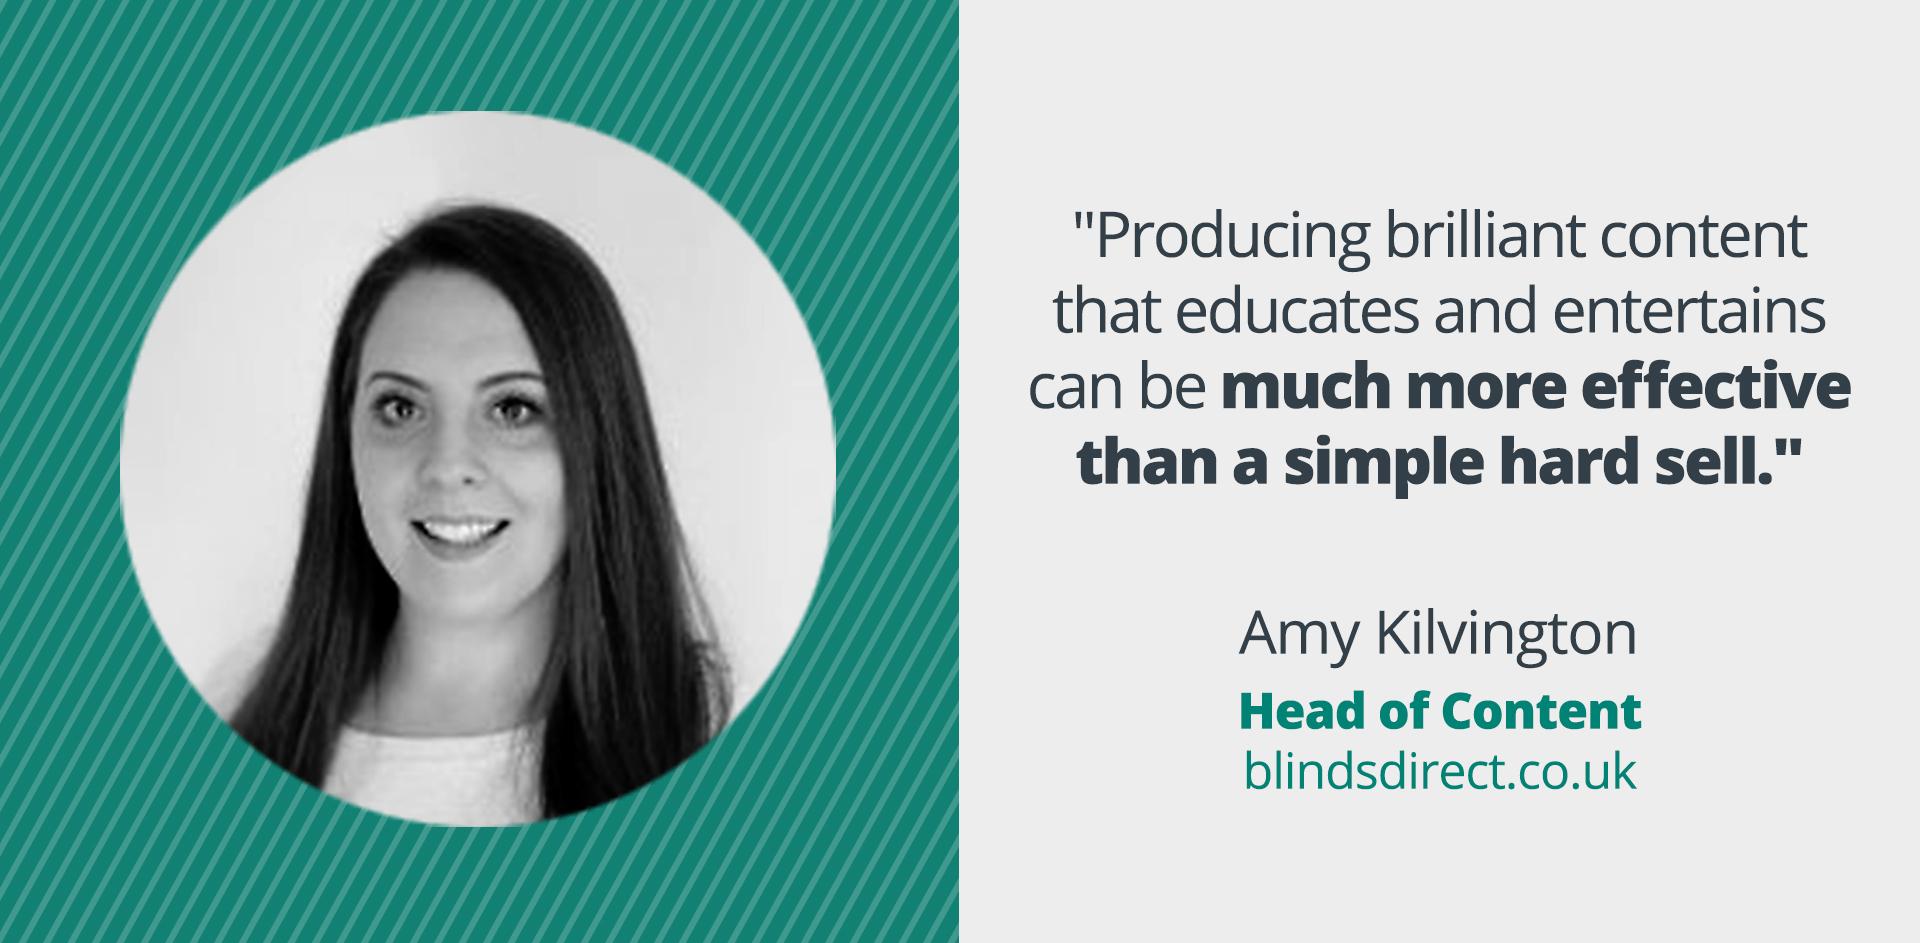 Amy Kilvington